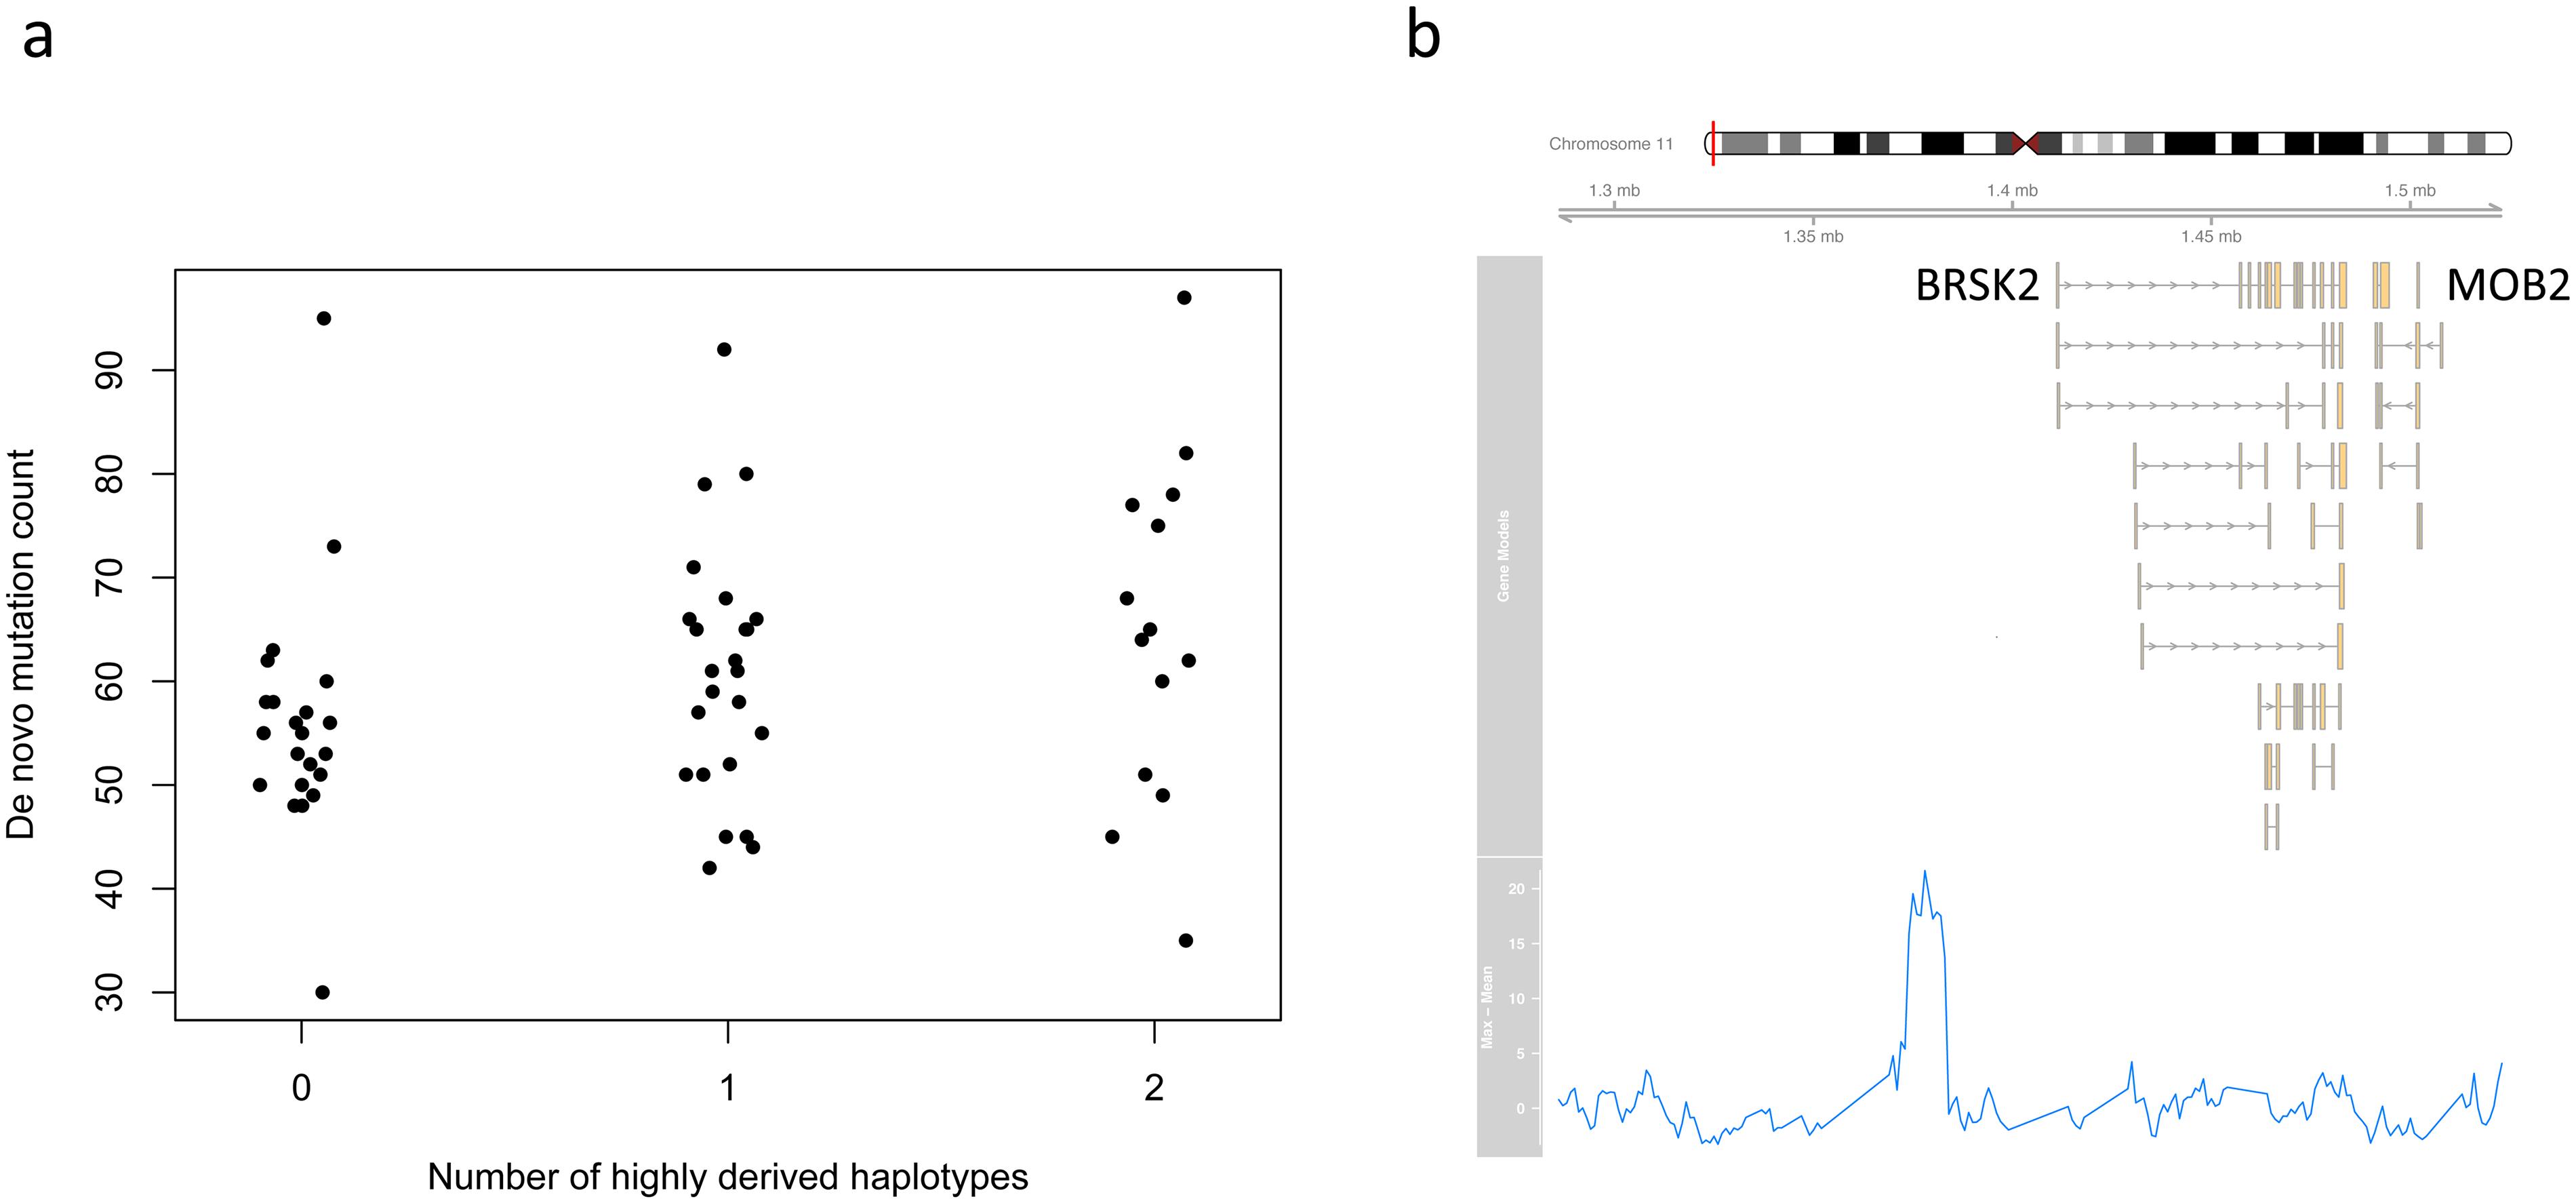 Putative mutator allele on chromosome 11.